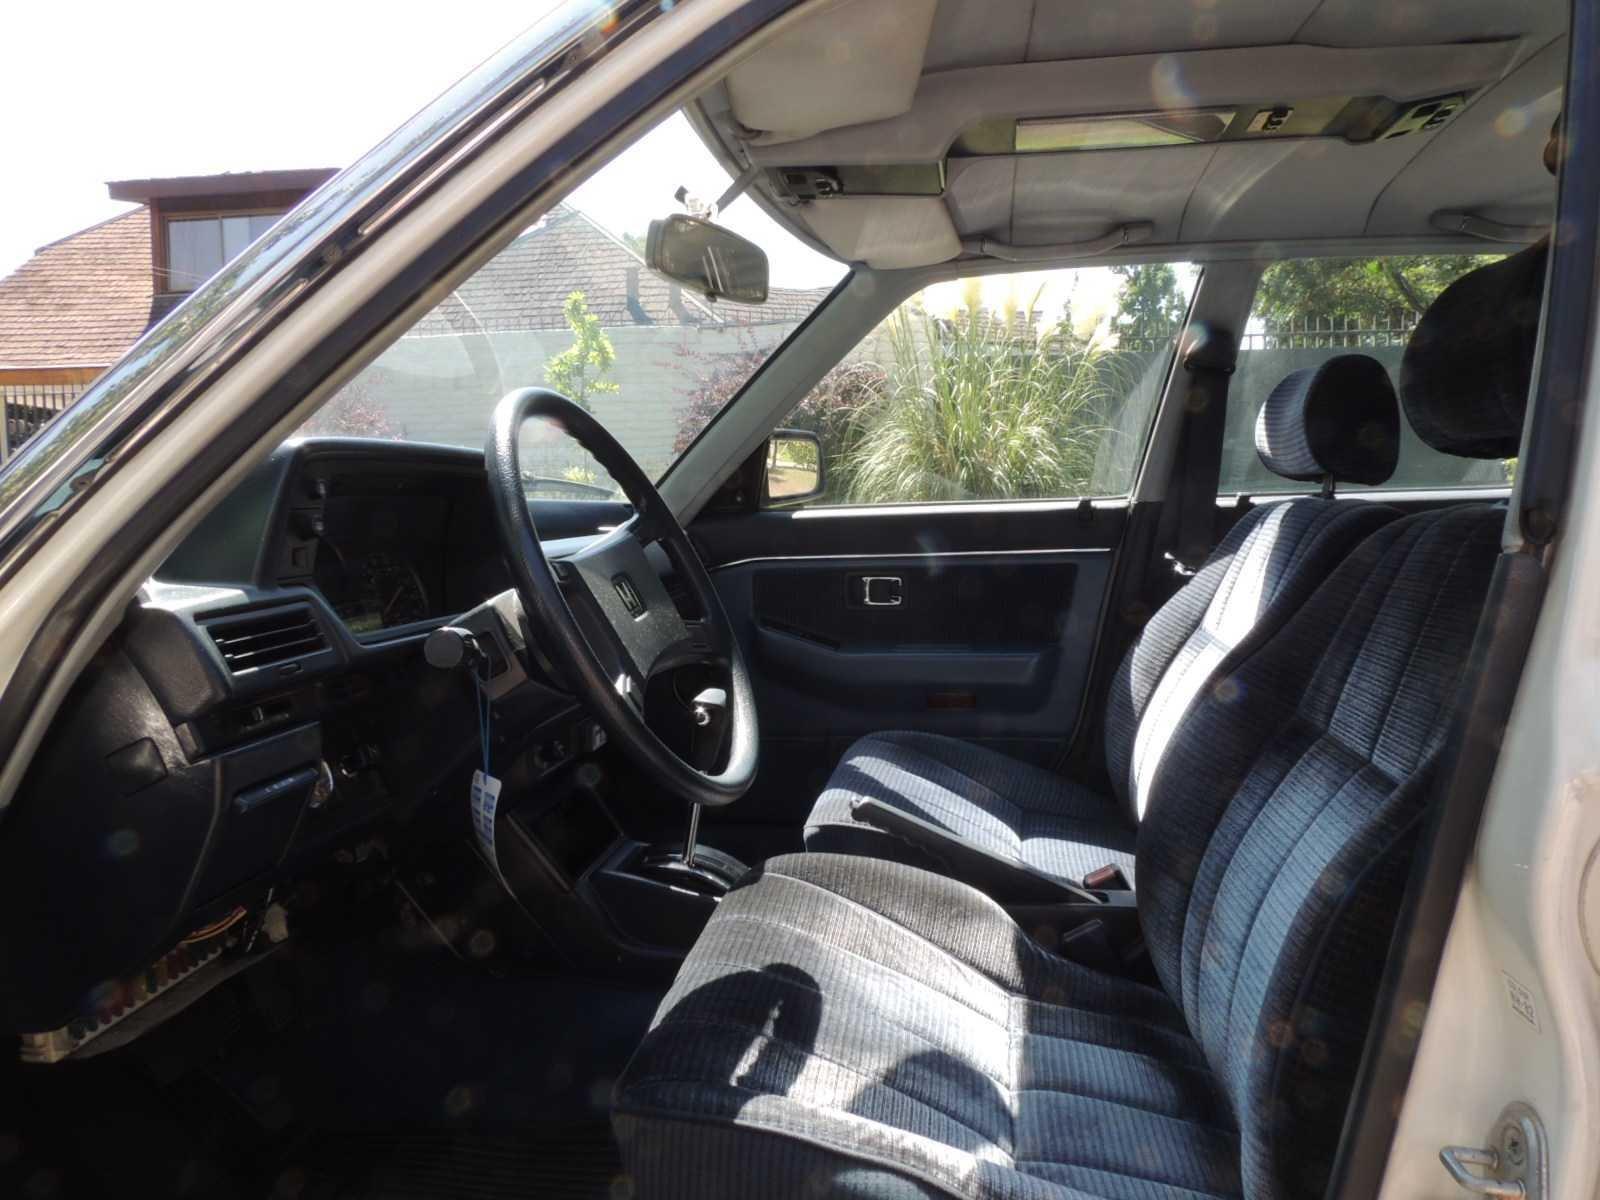 Honda Accord 1.6 EX Hondamatic 1983 Rutamotor Clásicos (43)